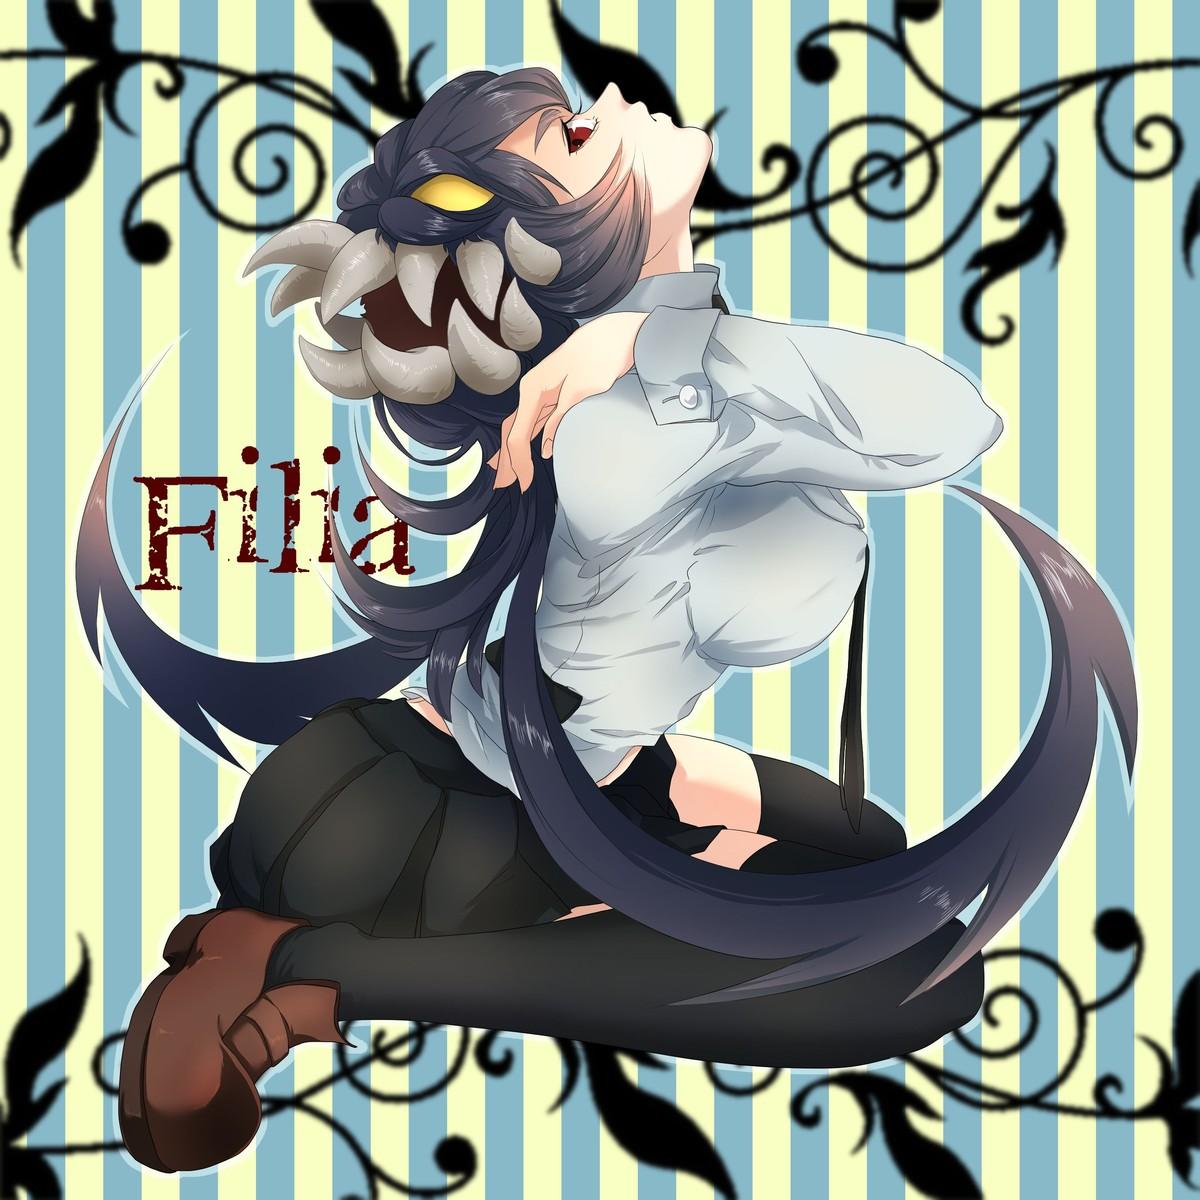 samson_(skullgirls)064